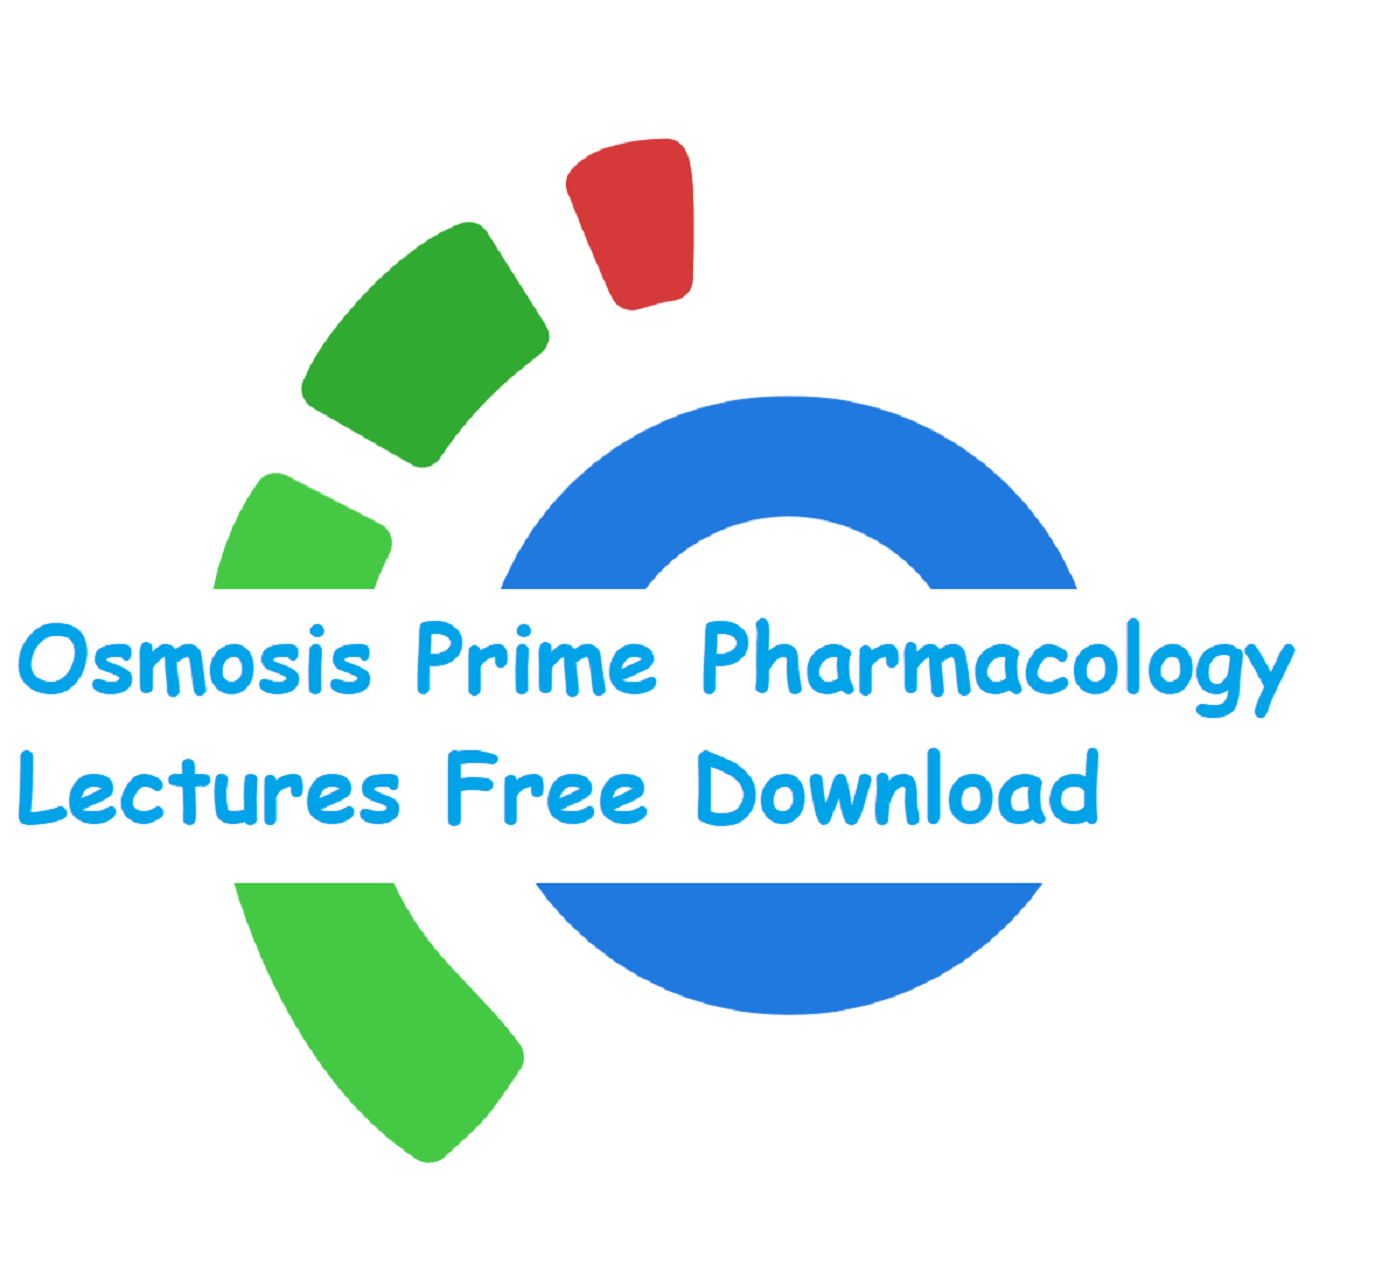 Osmosis Prime Pharmacology